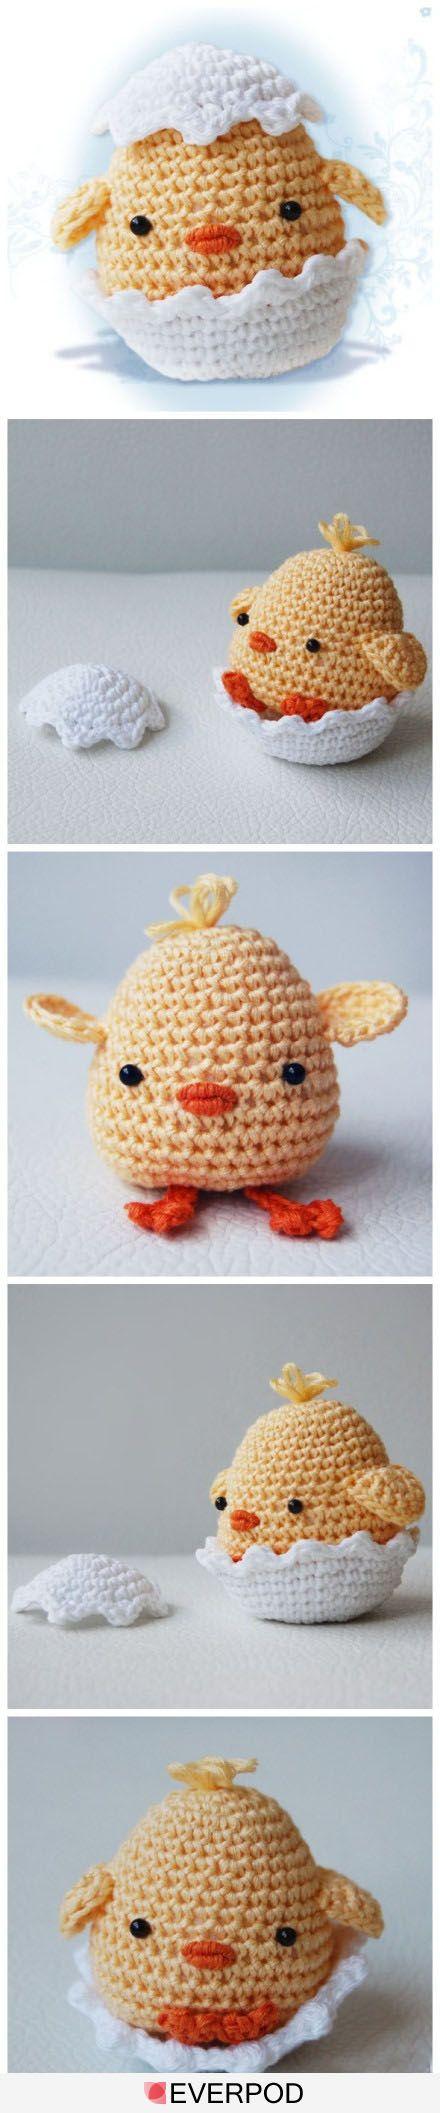 such a cute crochet chick!